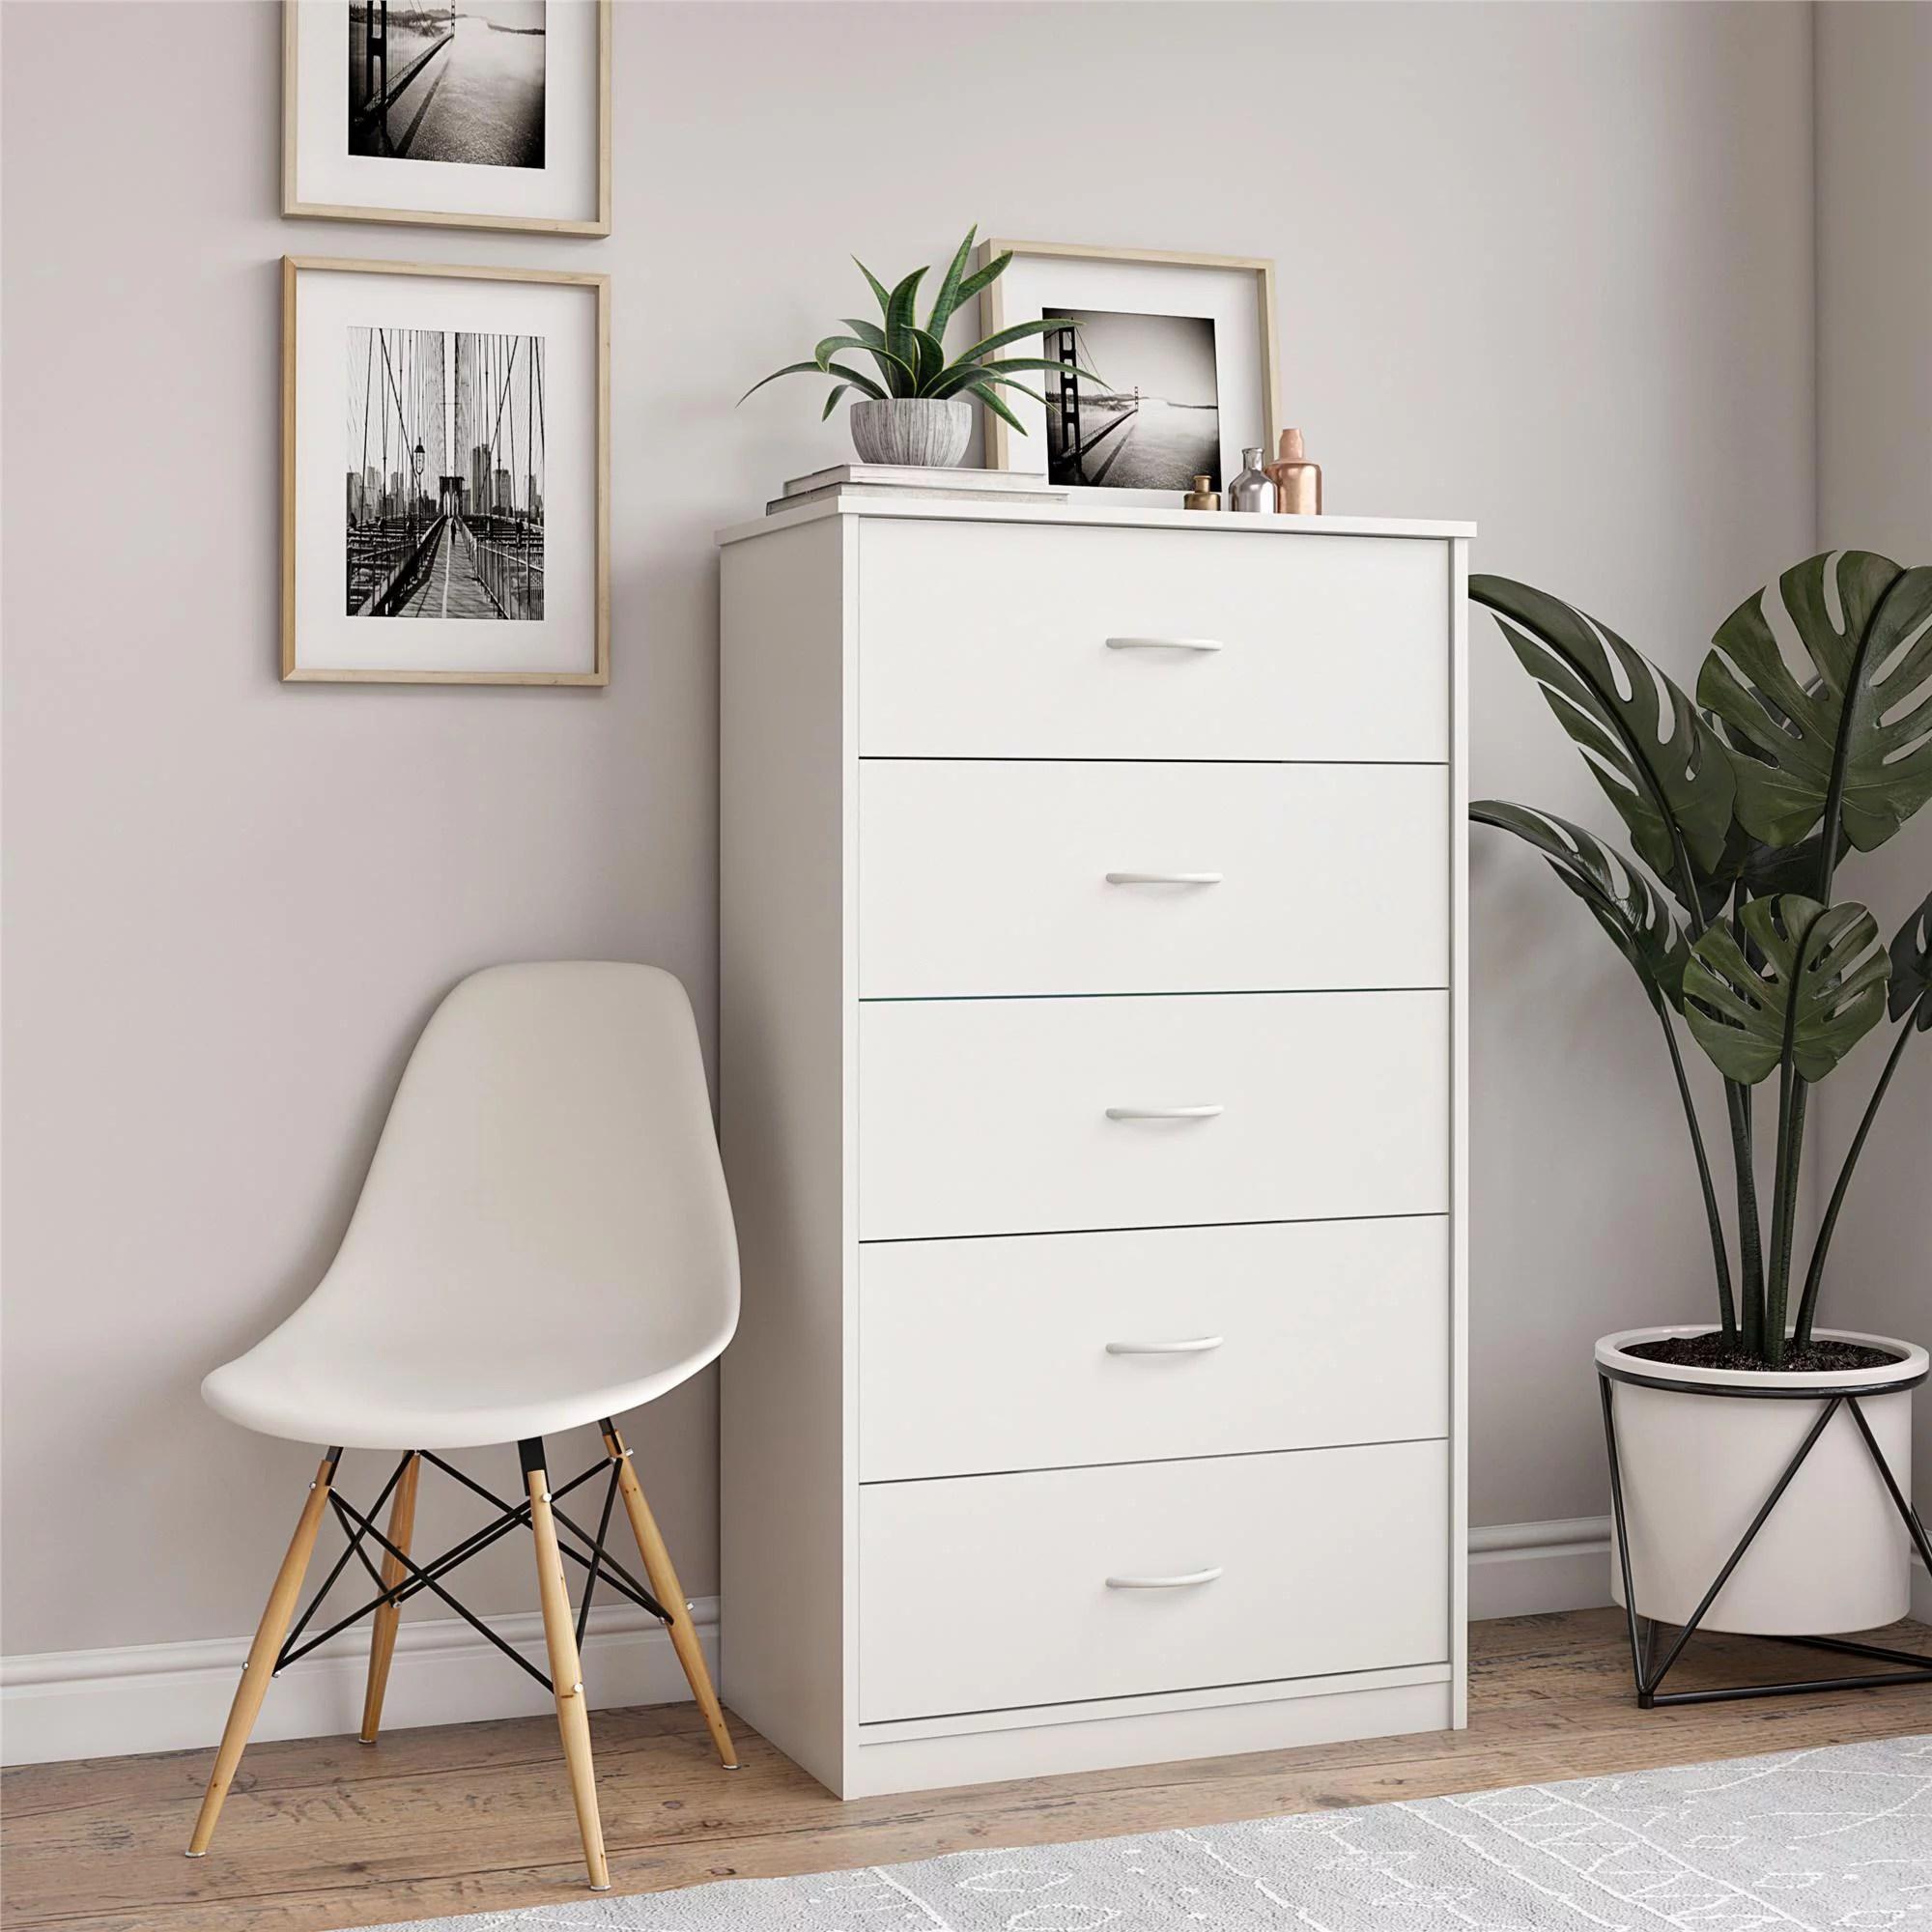 mainstays classic 5 drawer dresser white finish